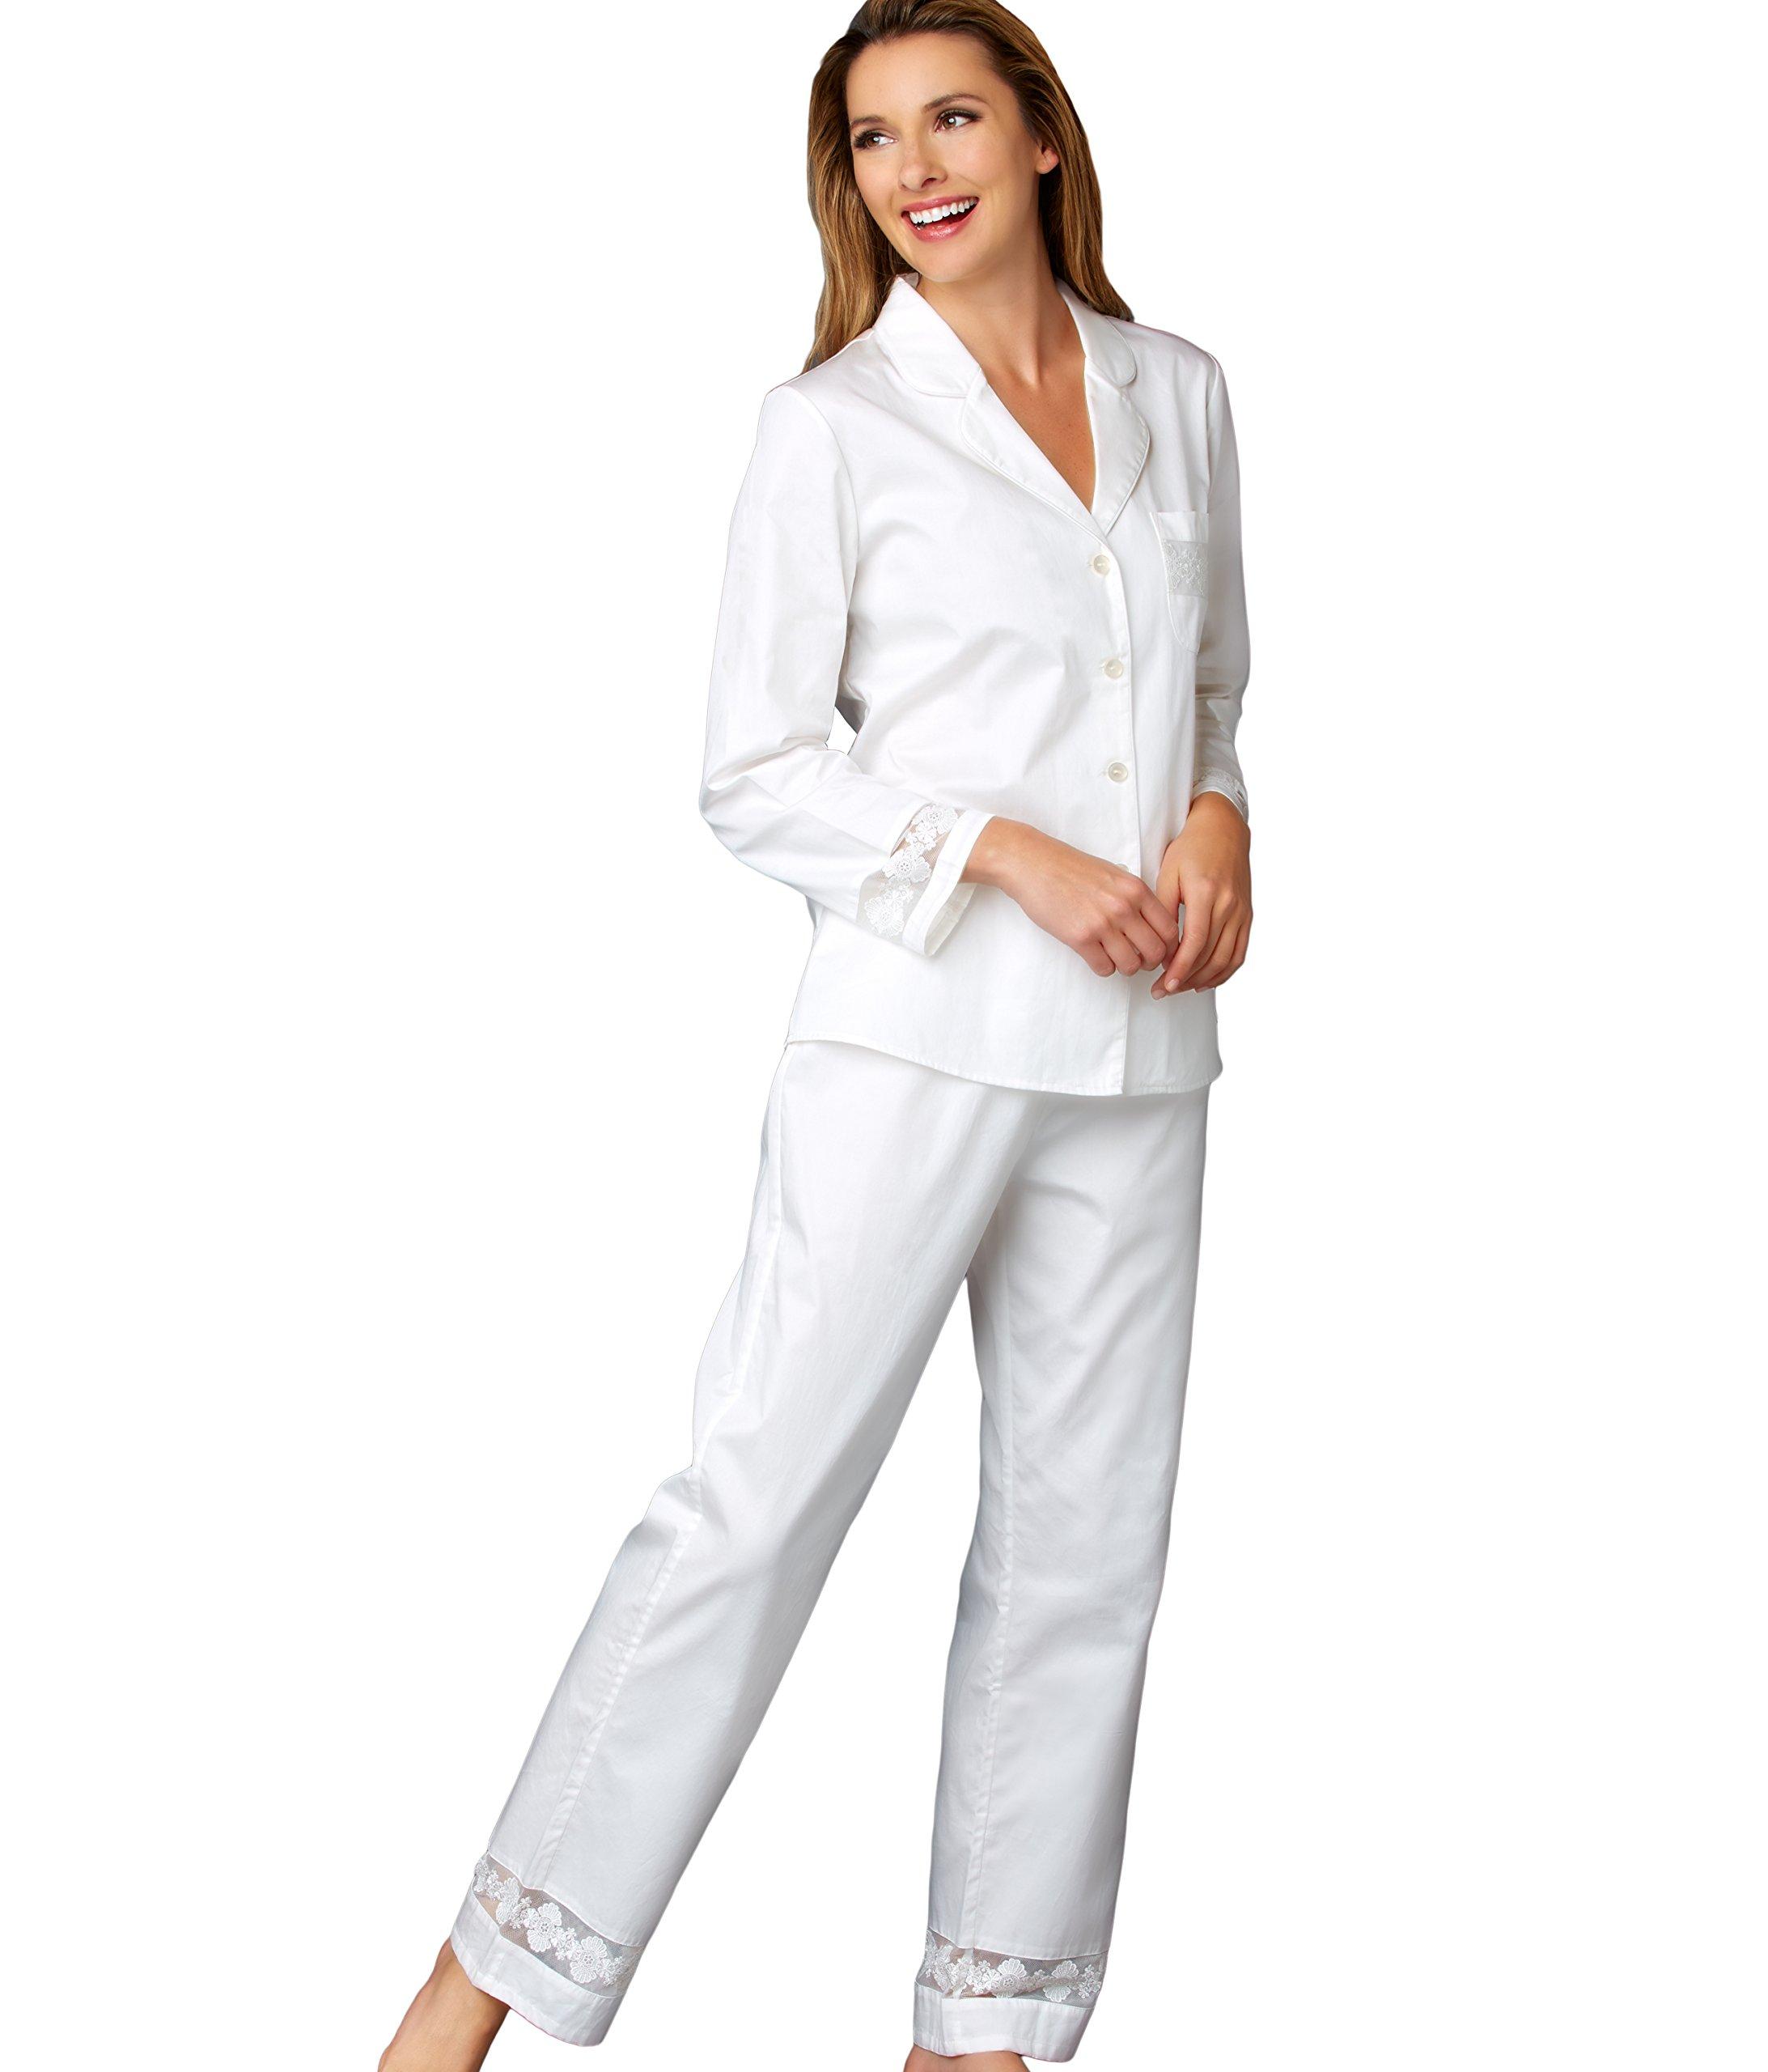 Julianna Rae Women's Pajama, 100% Cotton Sateen, Lace Trim, My New Favorite Collection, Milkshake, L